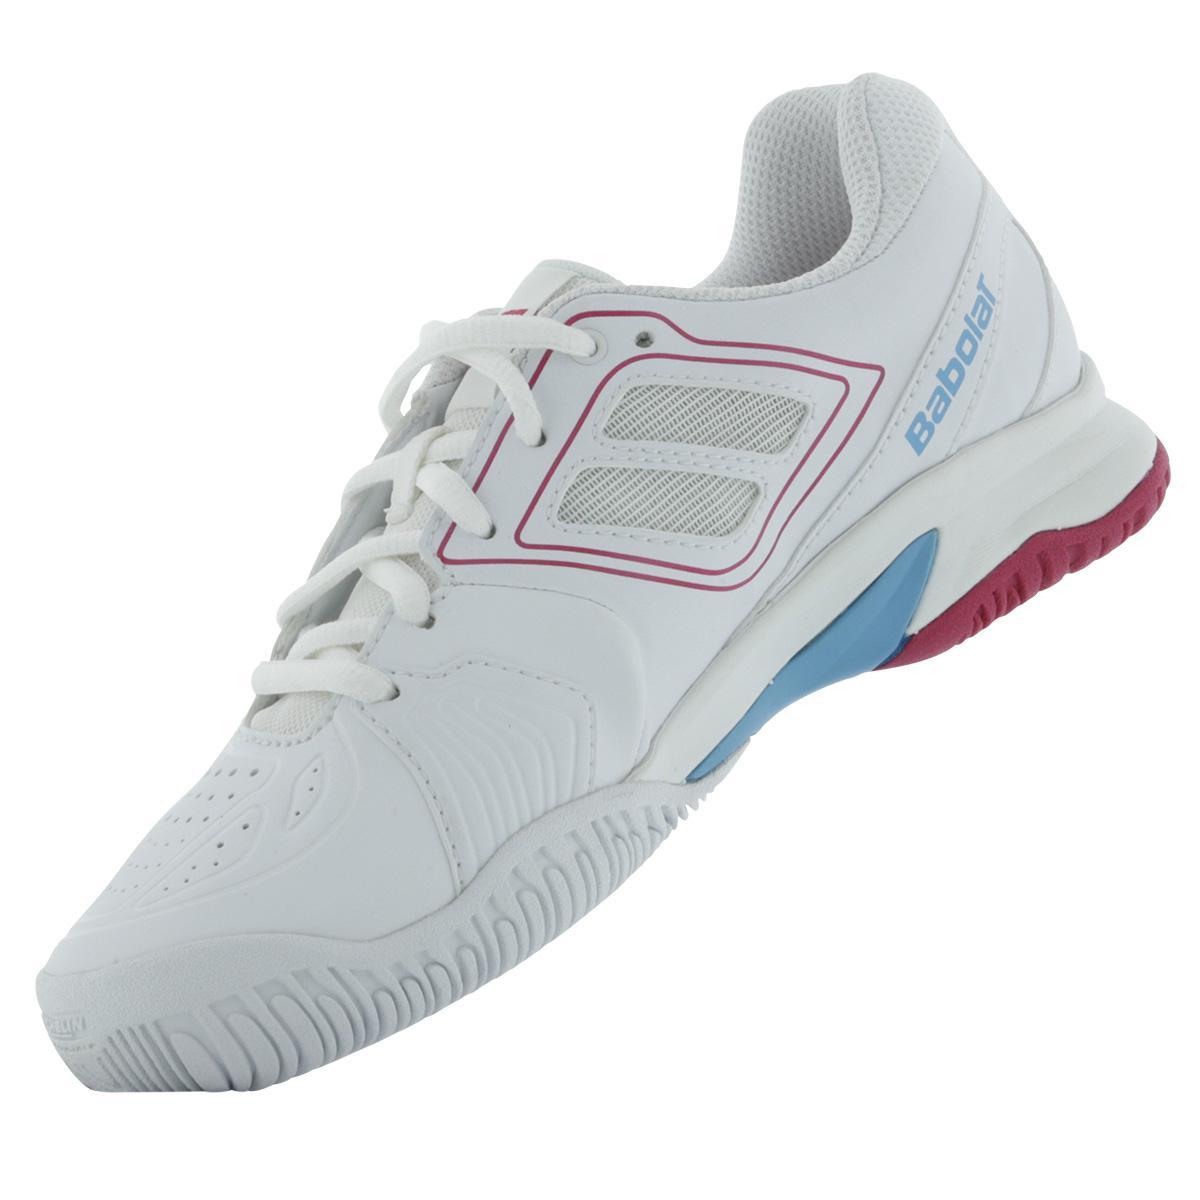 a898a6280db04 Babolat Girls Propulse Team BPM Junior Tennis Shoes - White/Pink